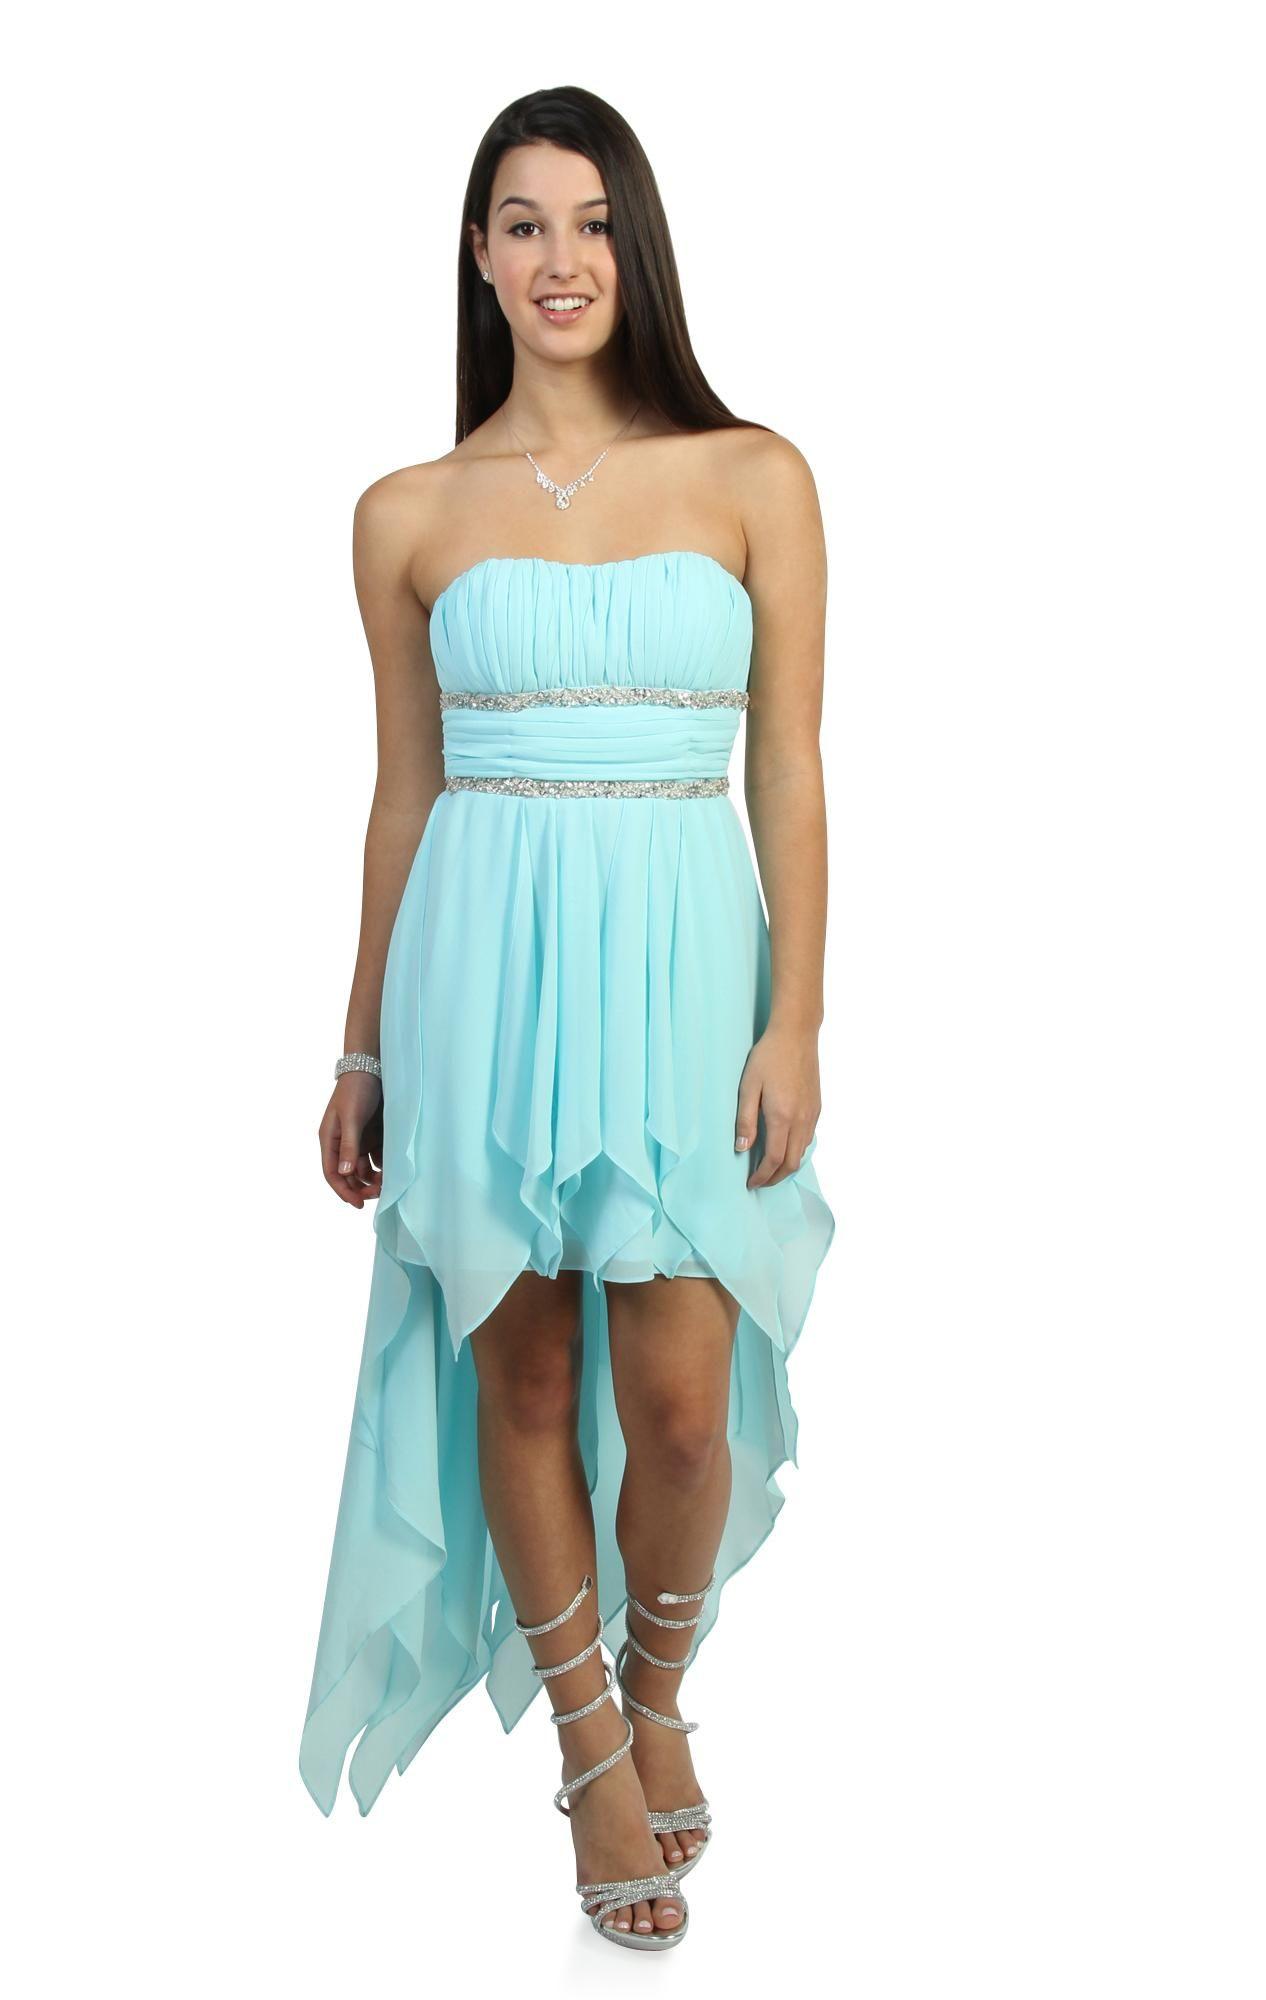 Beaded chiffon tendril prom dress when i marry my best friend